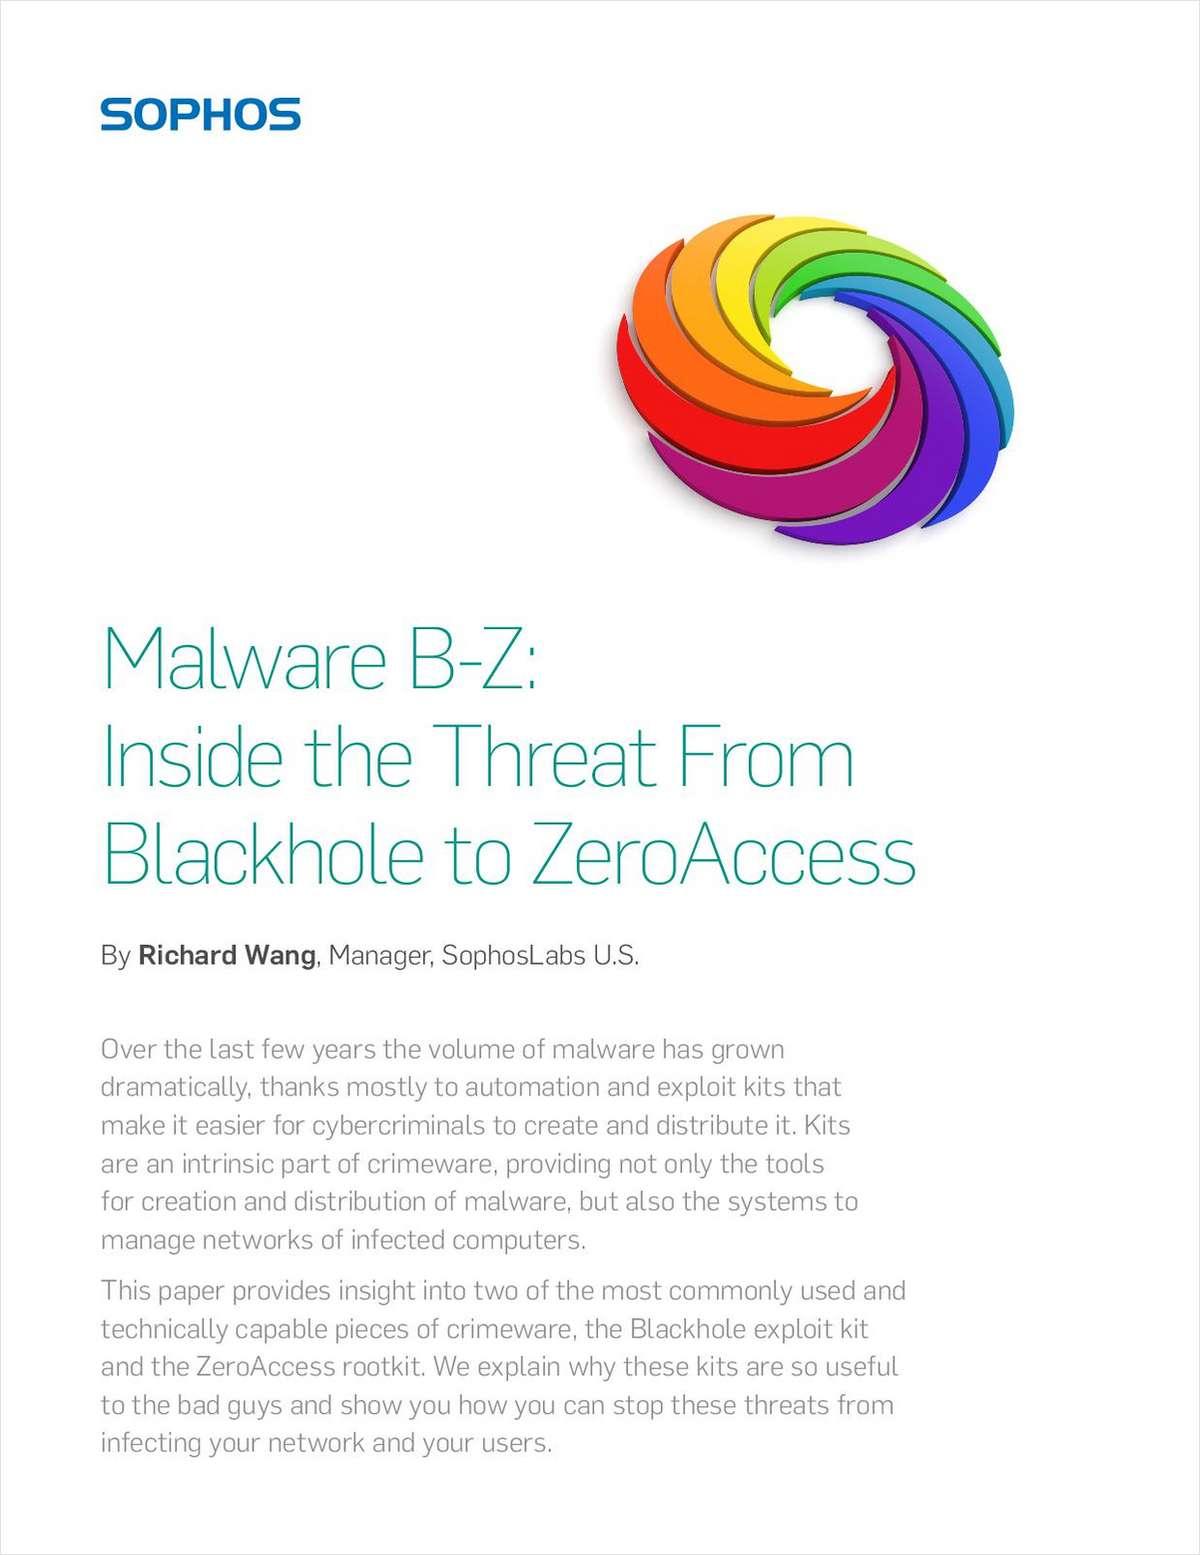 Malware B-Z: Inside the Threat From Blackhole to ZeroAccess